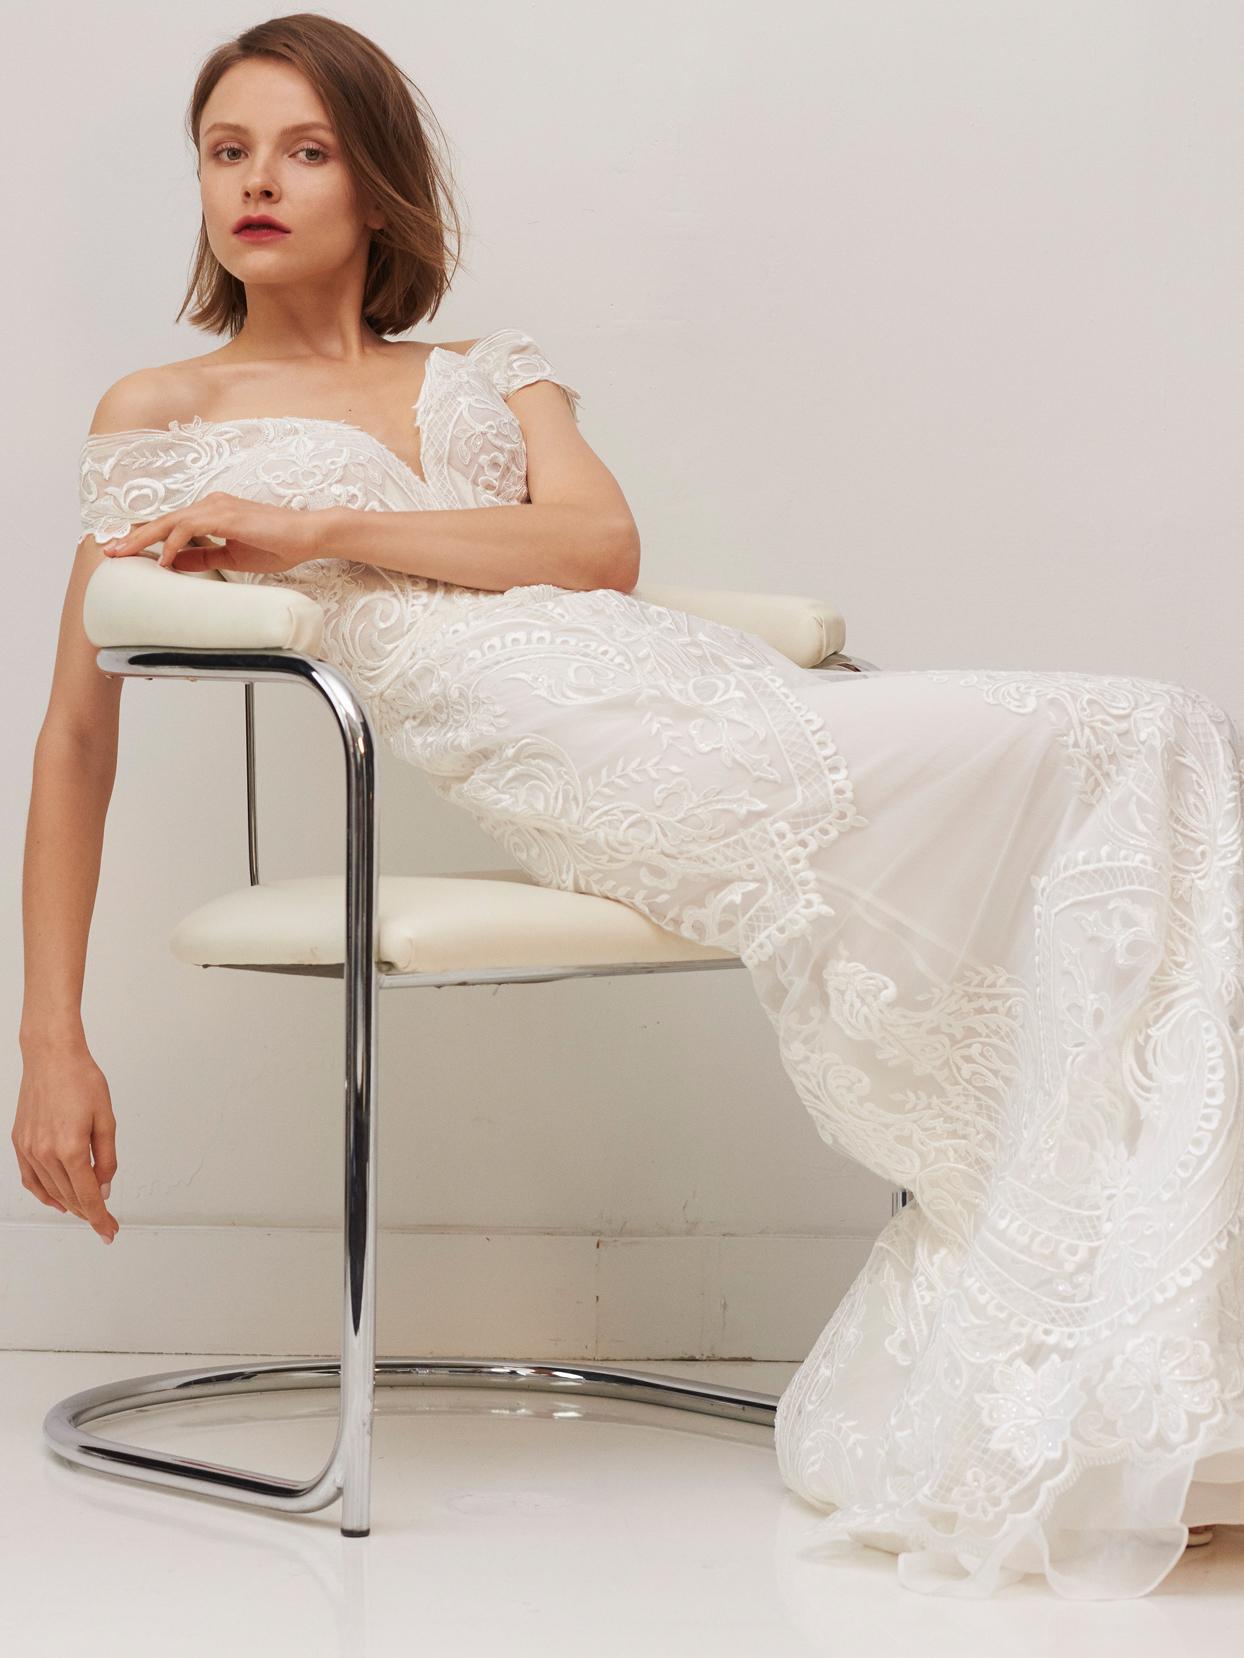 rivini by rita vinieris off-the-shoulder embroidered sheath wedding dress fall 2020